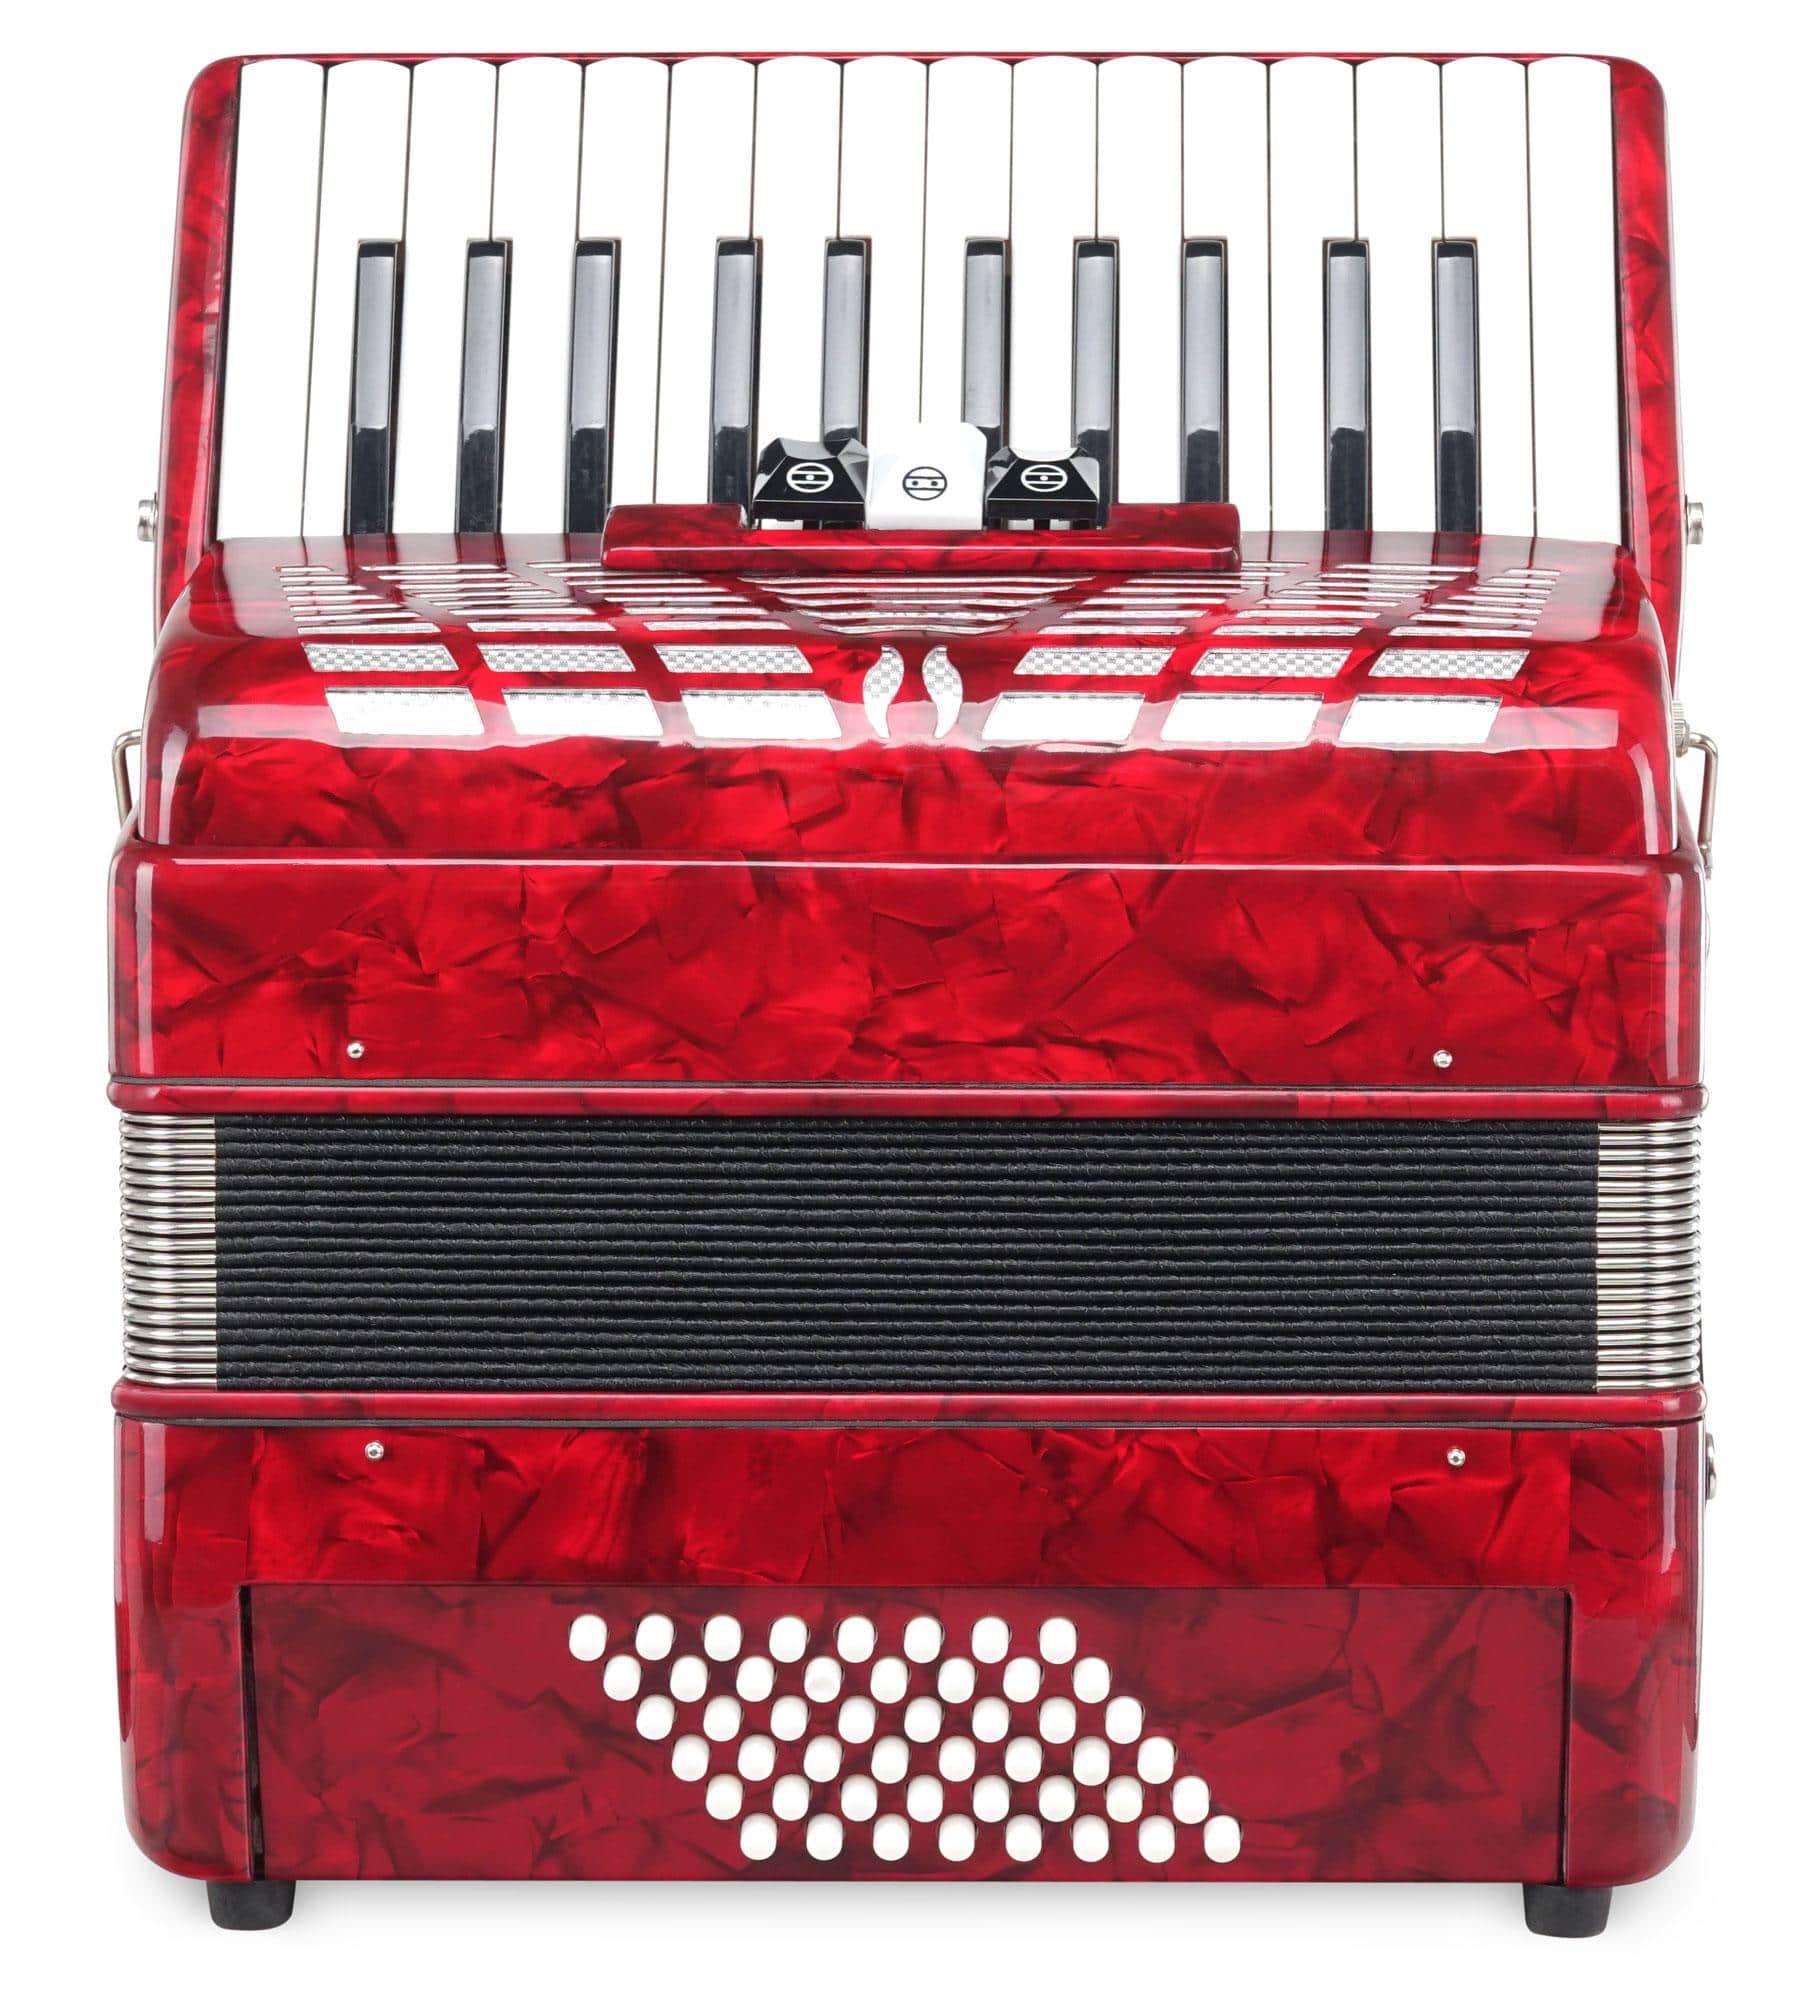 Classic Cantabile 48 Bass Akkordeon